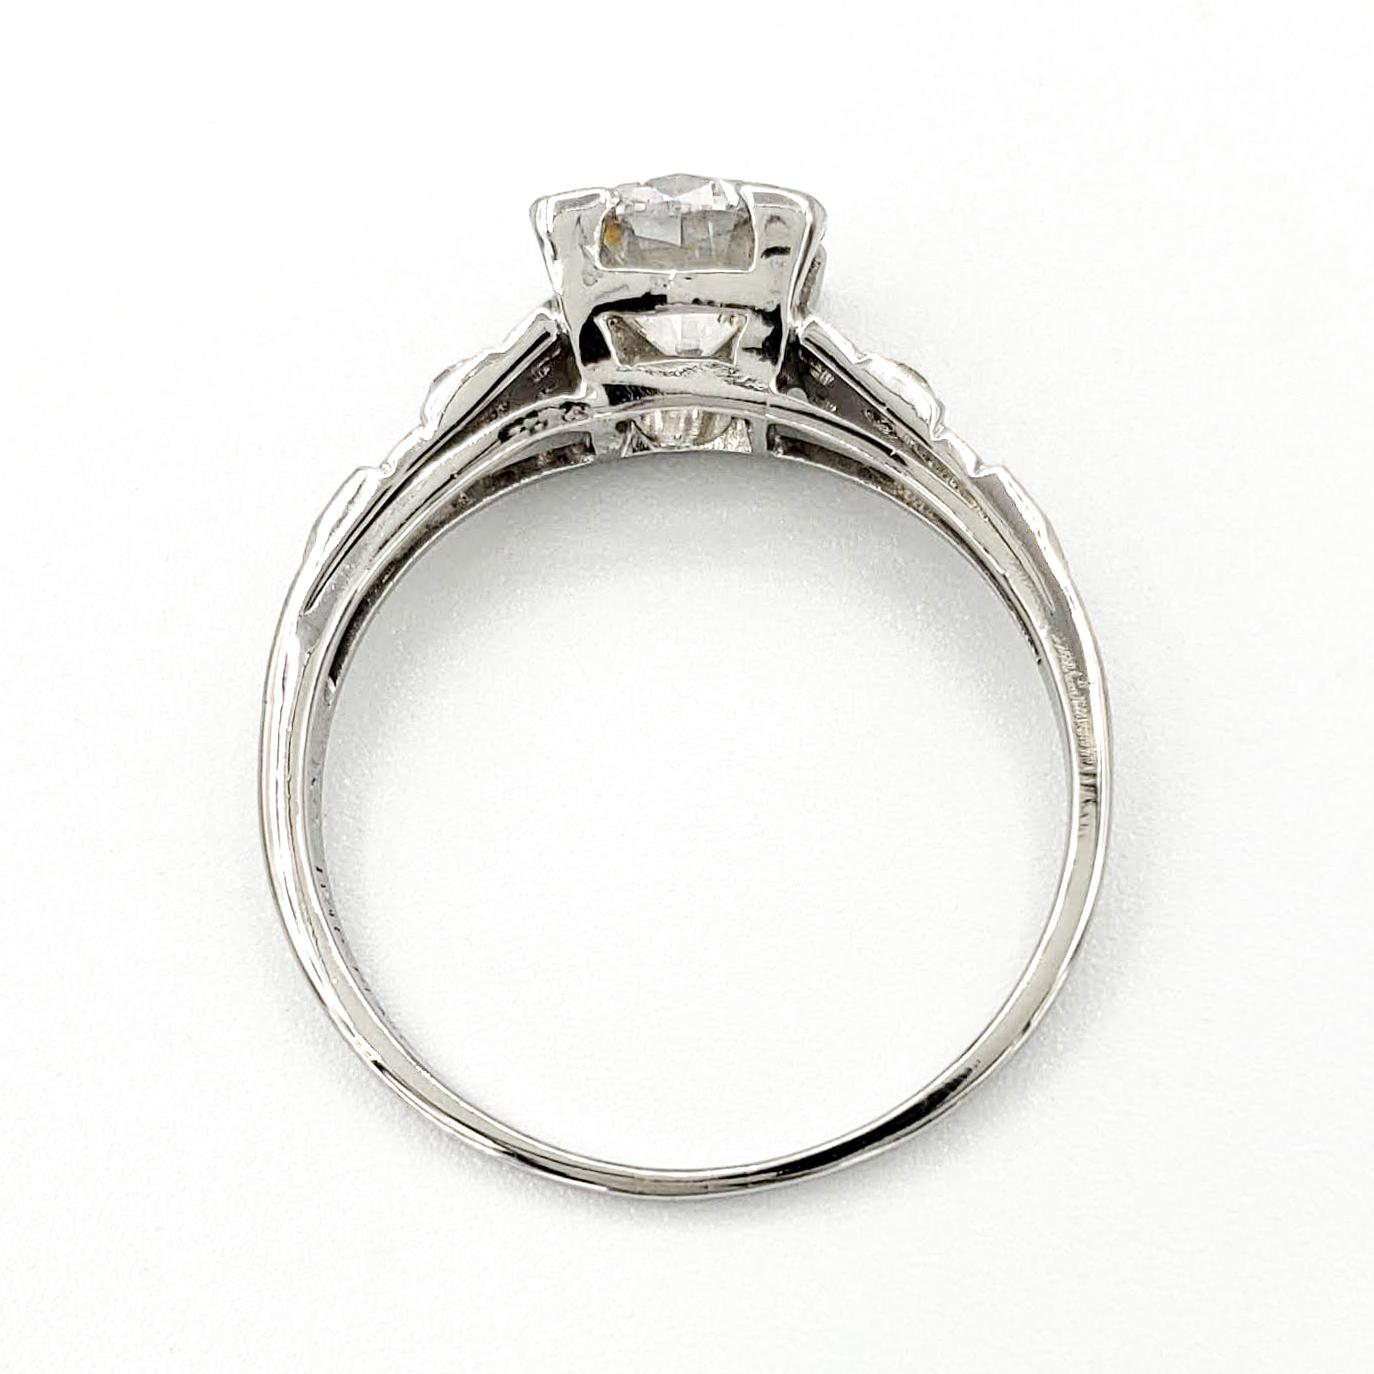 vintage-platinum-engagement-ring-with-1-05-carat-round-brilliant-cut-diamond-gia-i-si1